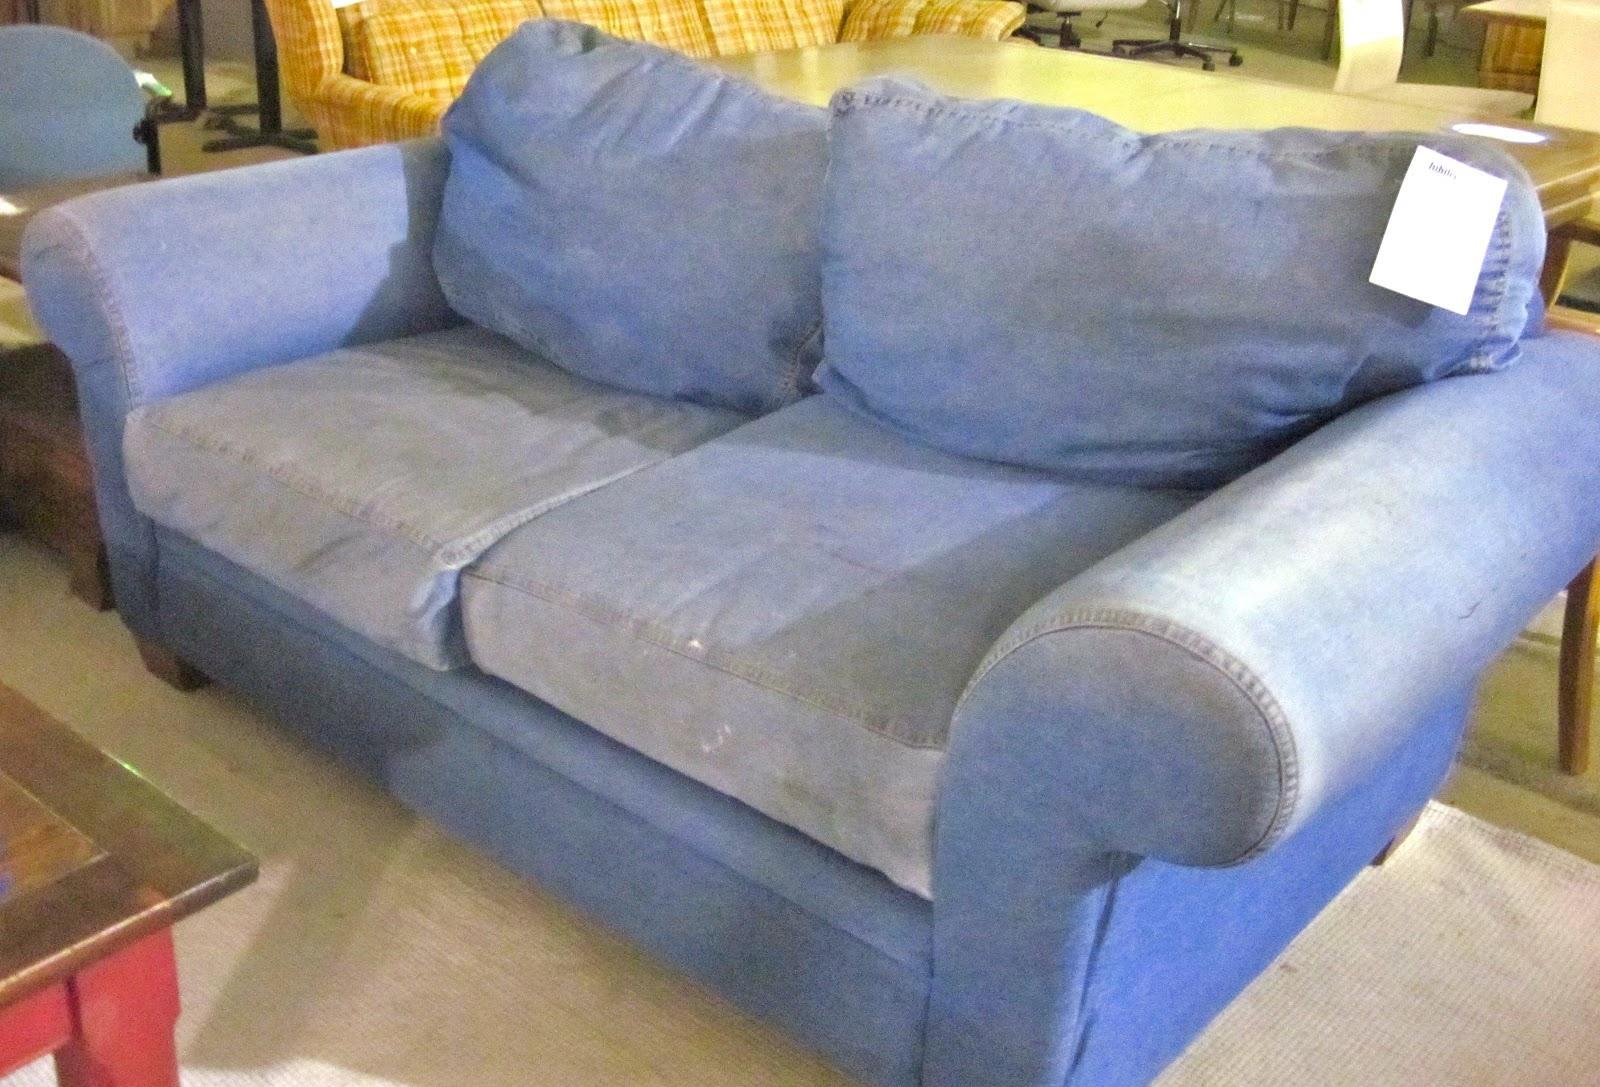 Denim Sofa And Loveseat Denim Fabric Modern Sofa Loveseat Set W Intended For Denim Sofas And Loveseats (View 4 of 12)